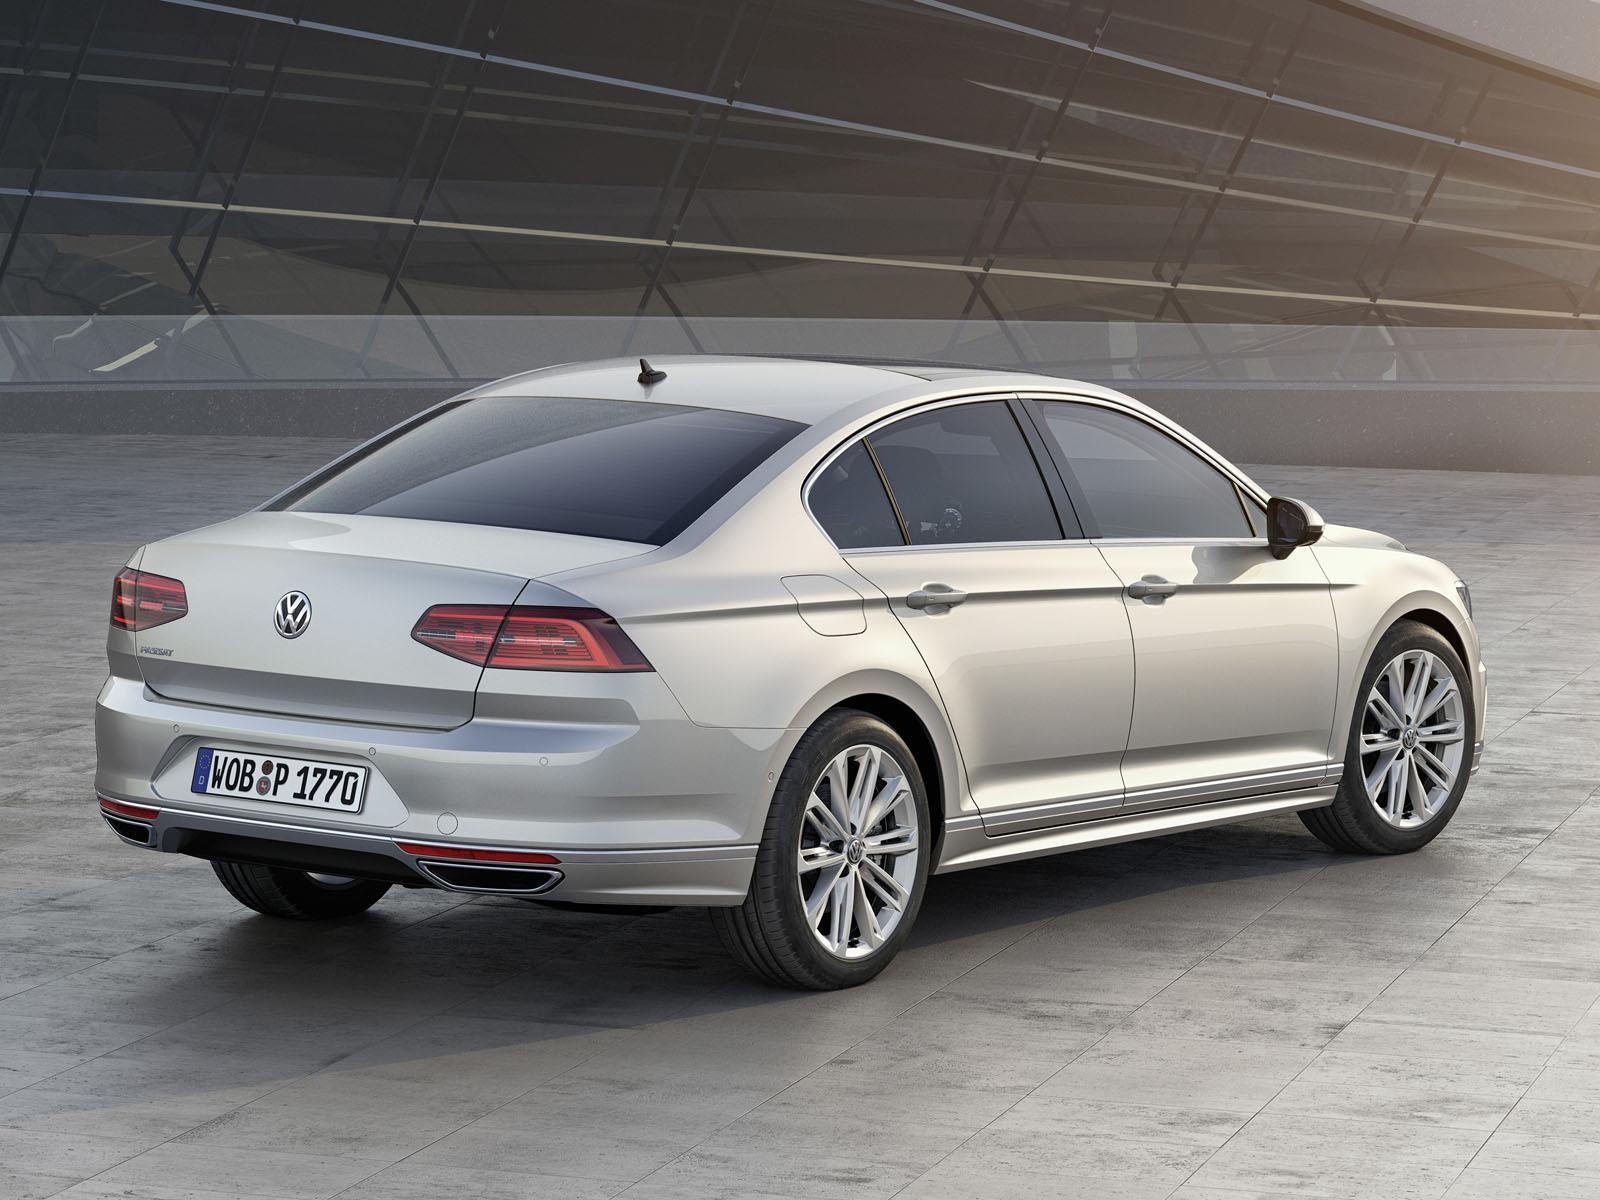 Volkswagen Passat 2015 se presenta - Autocosmos.com